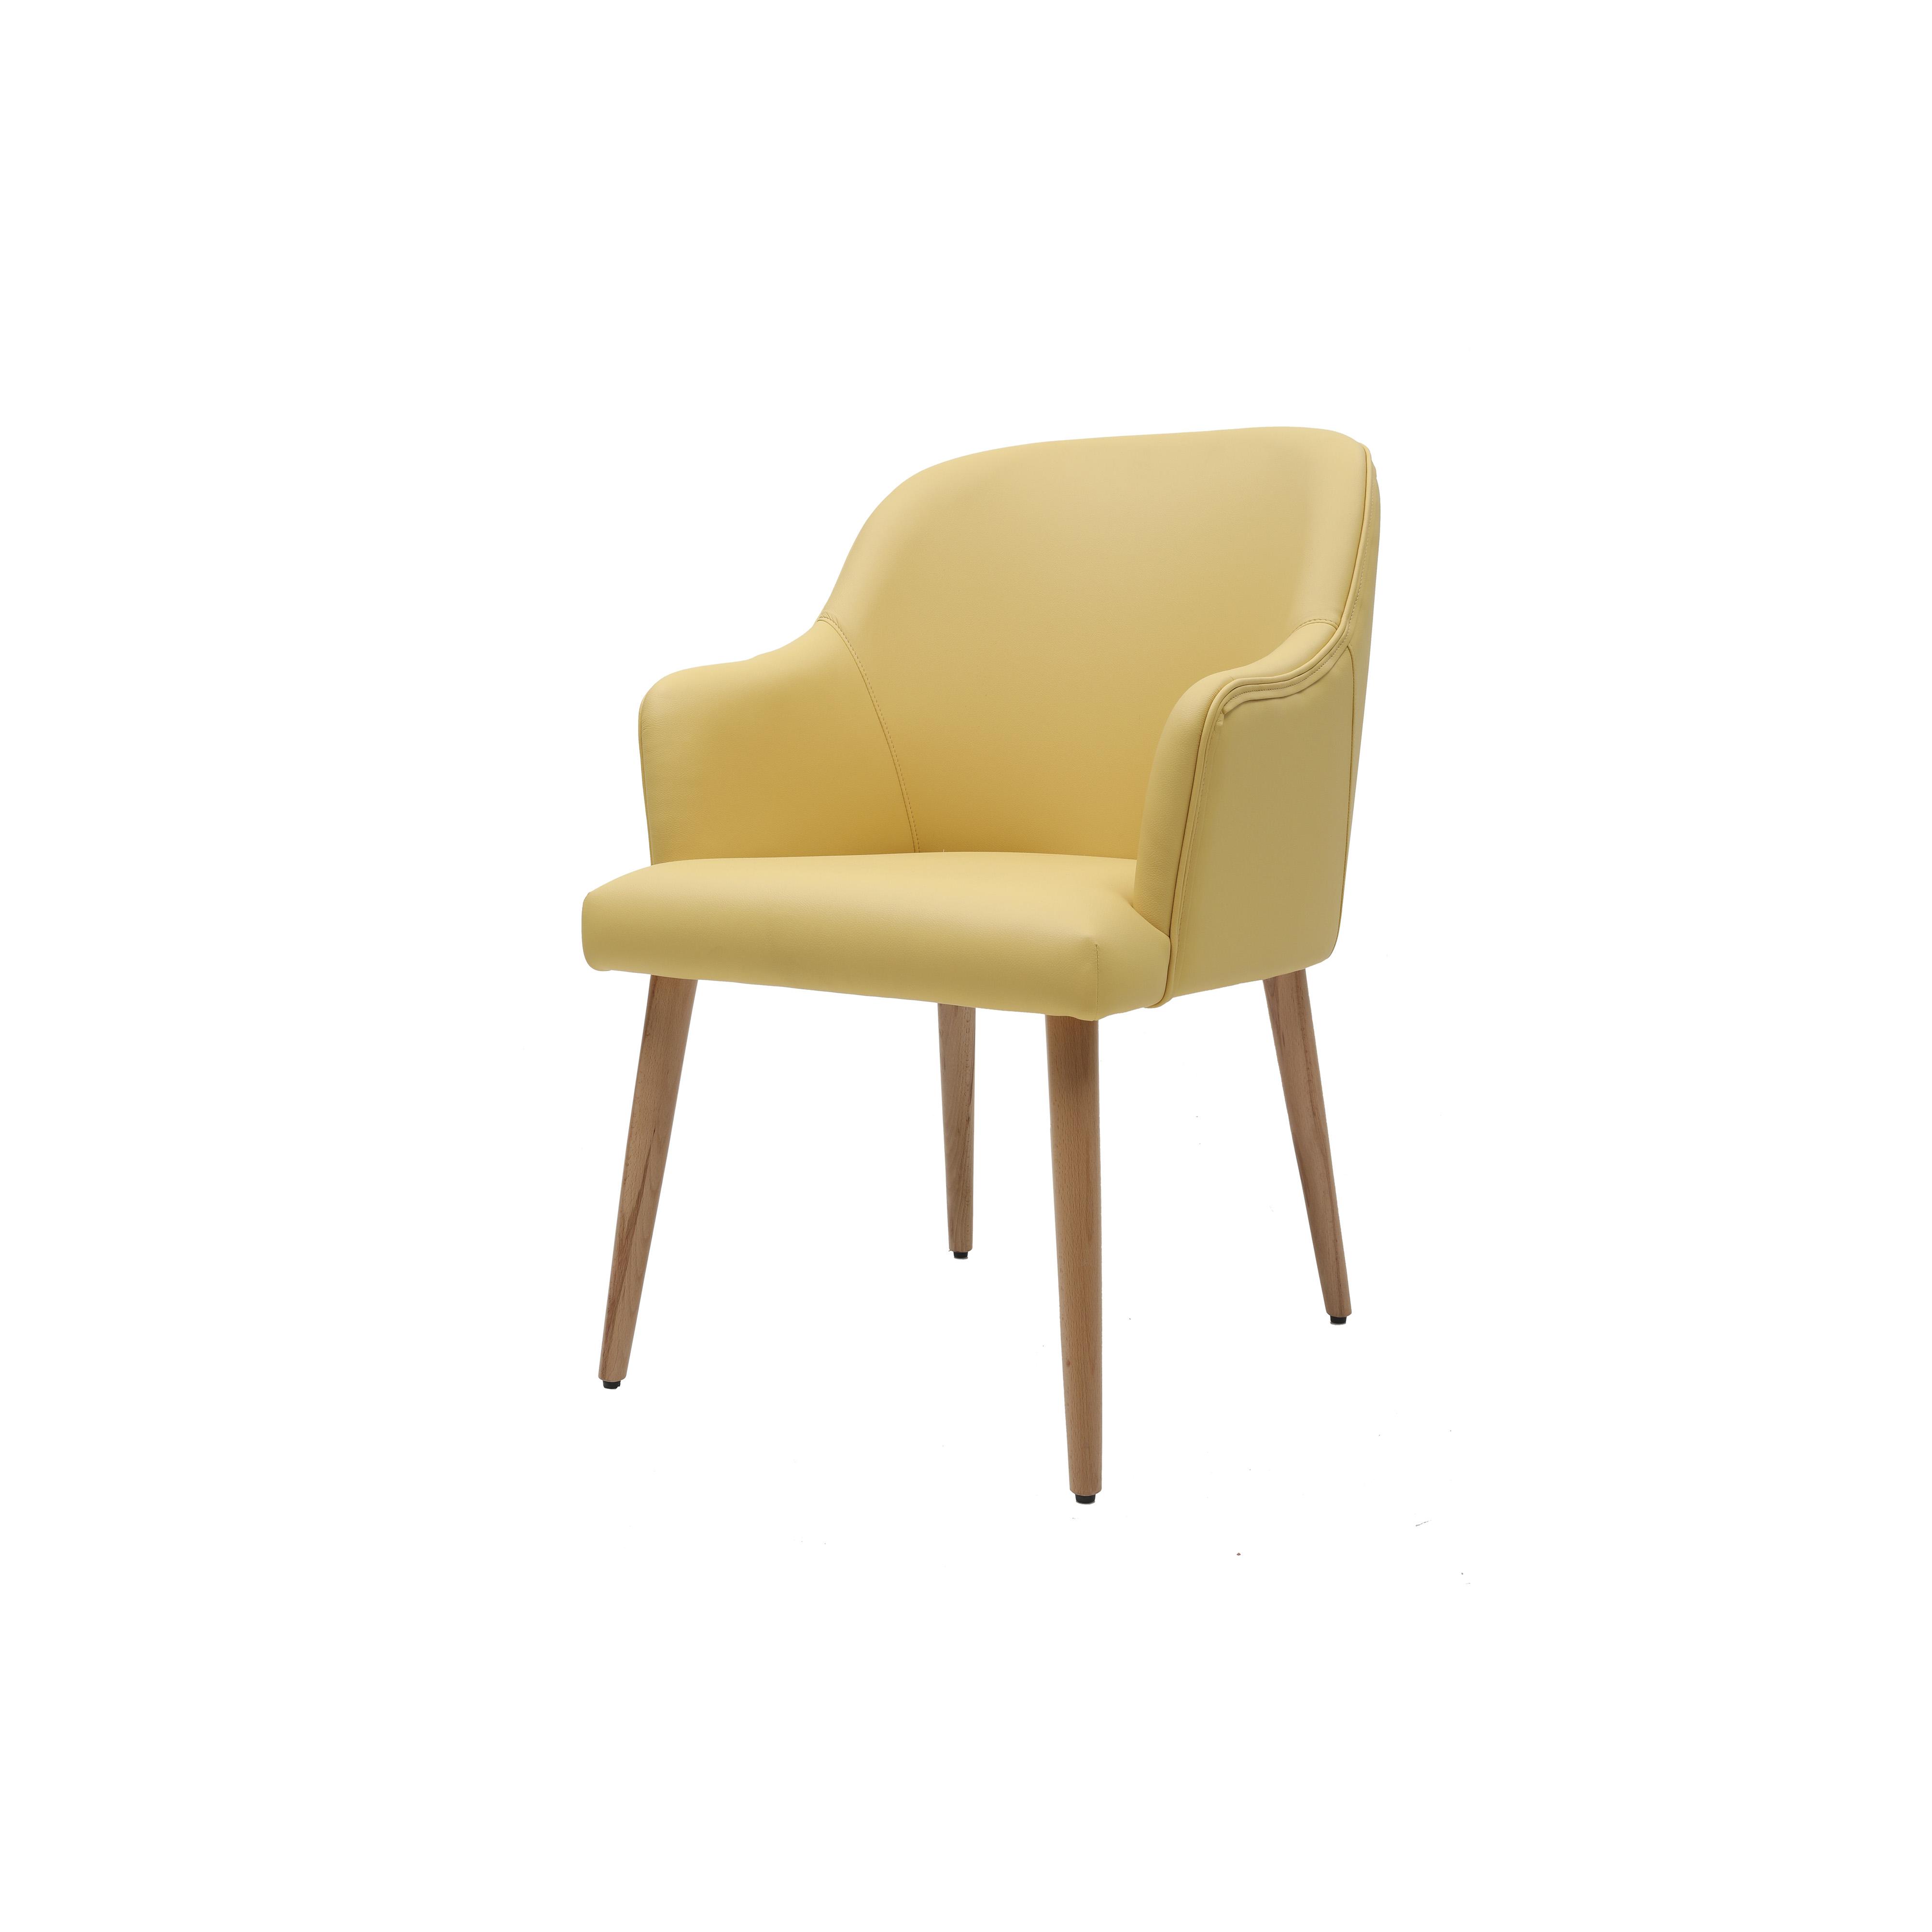 Eight hour chair